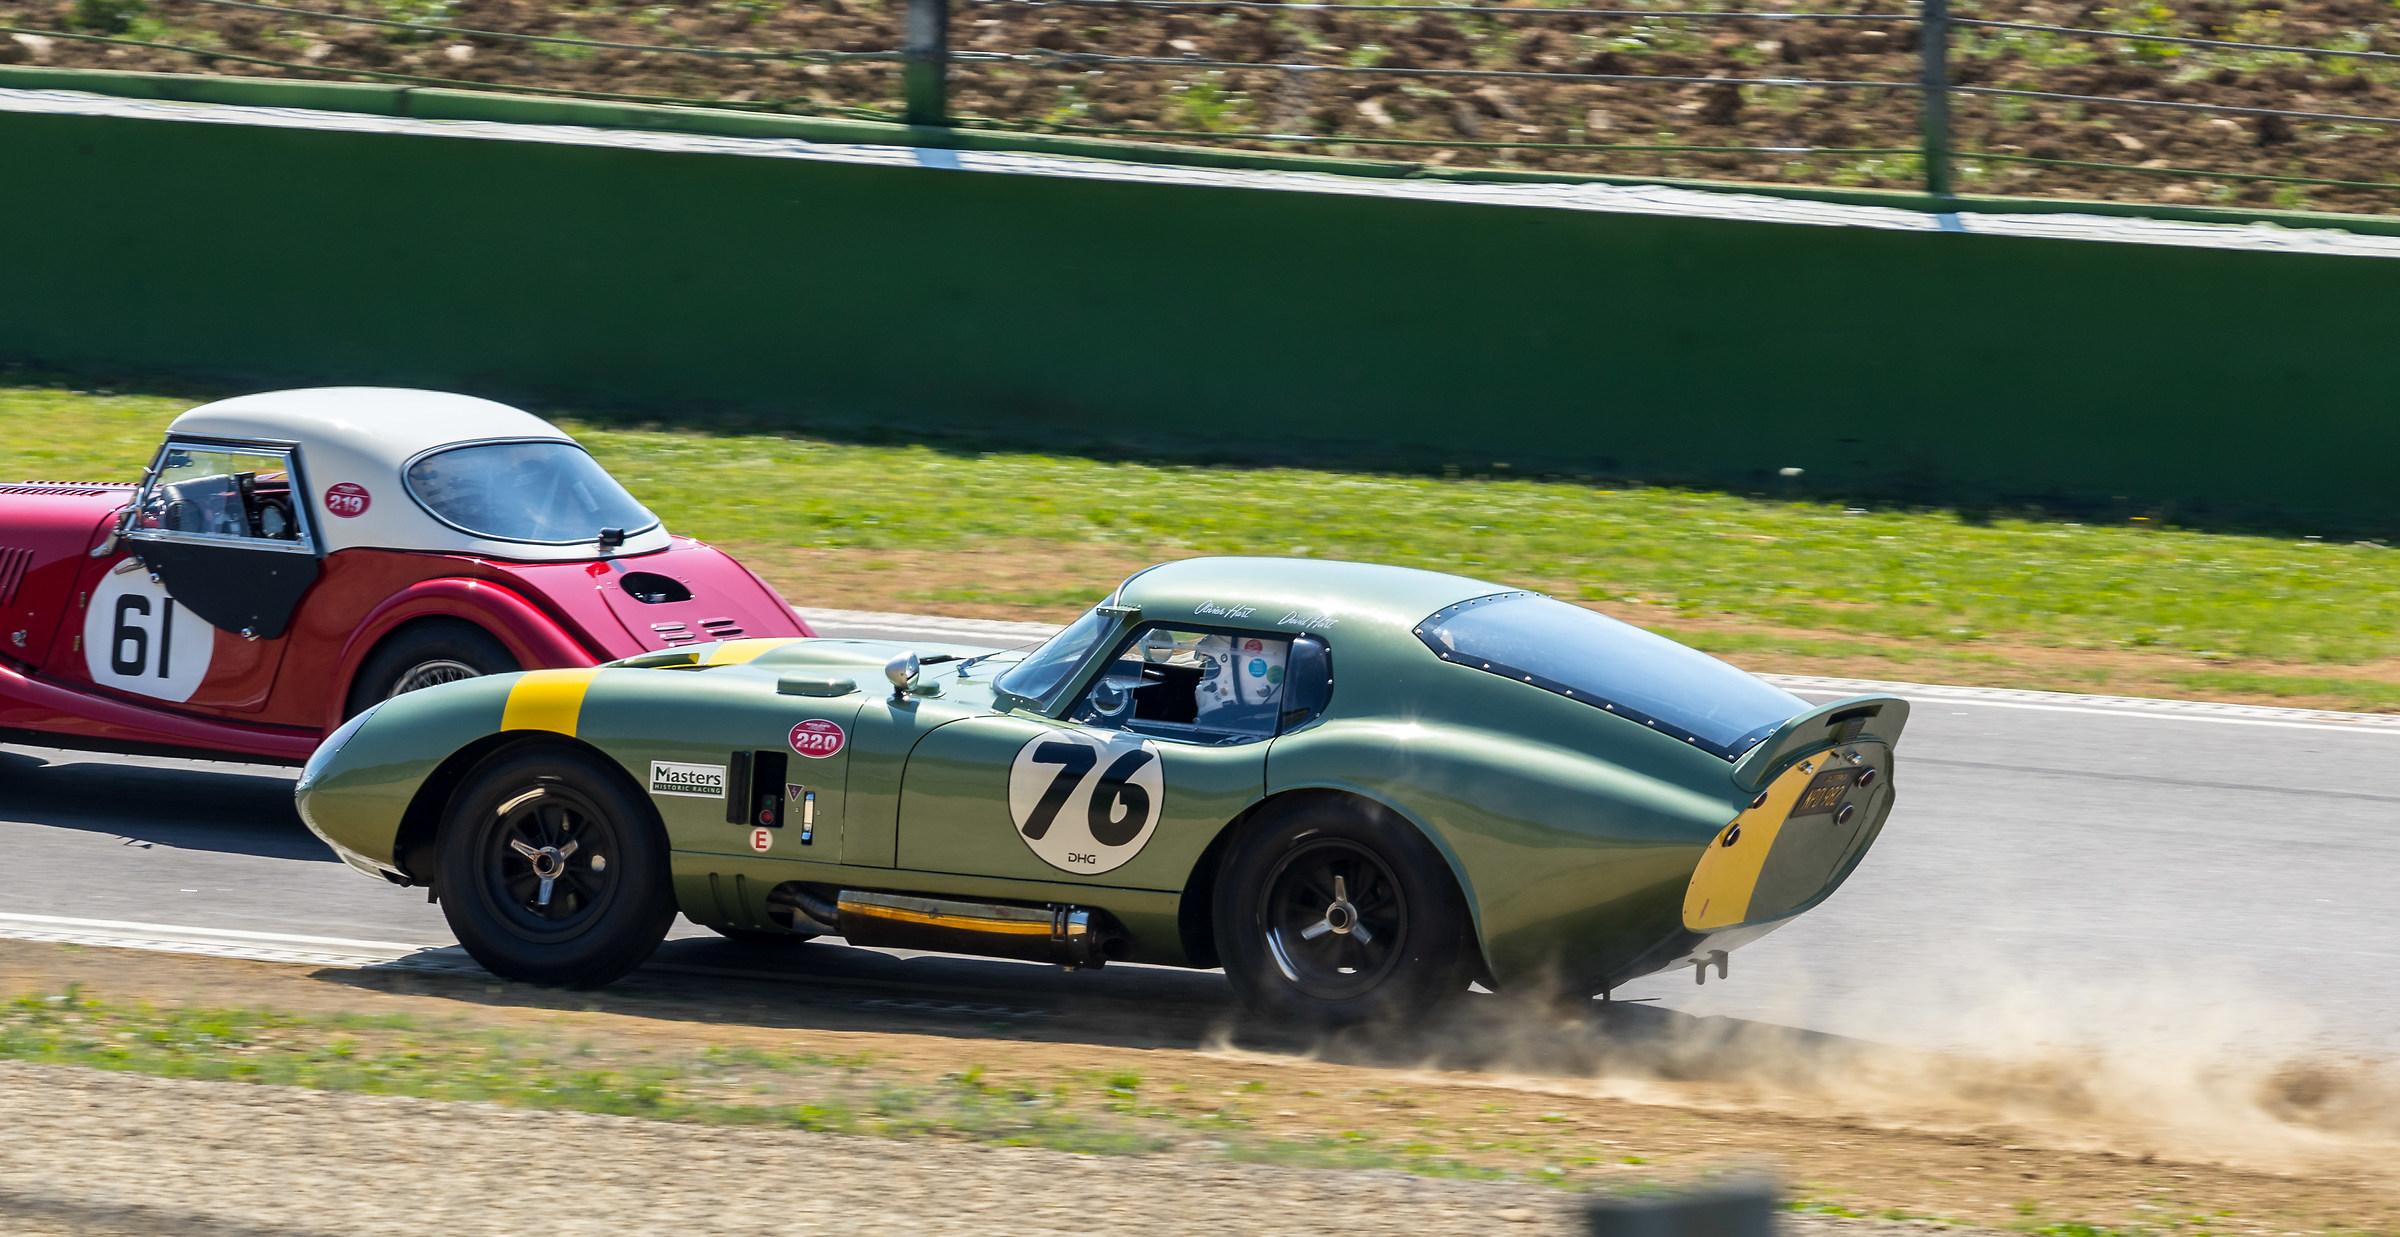 Motor legend imola ...